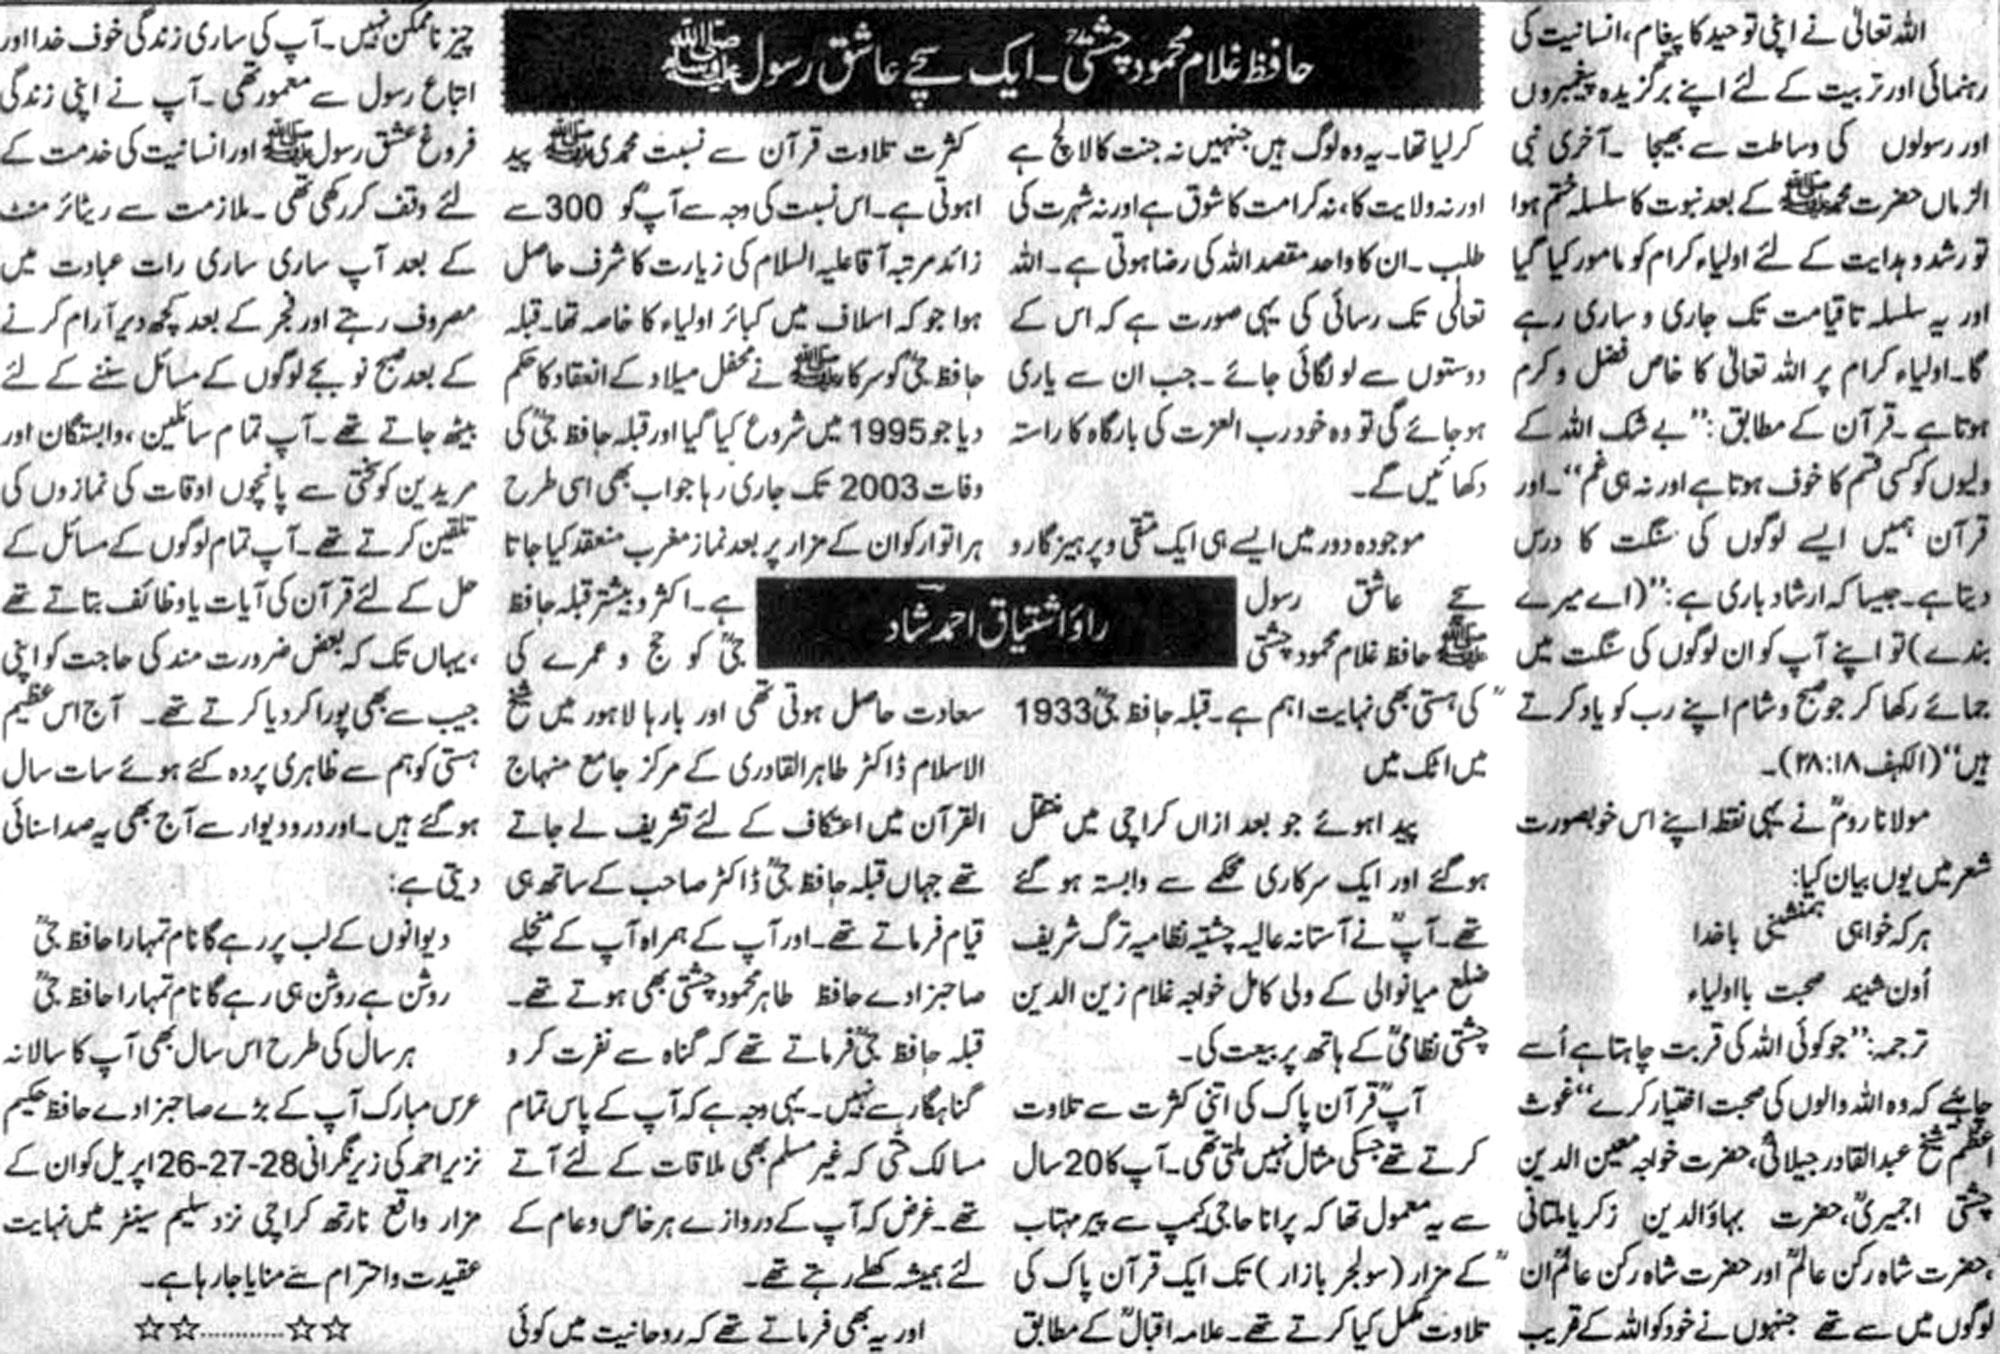 Minhaj-ul-Quran  Print Media Coverage Daily National Page Column